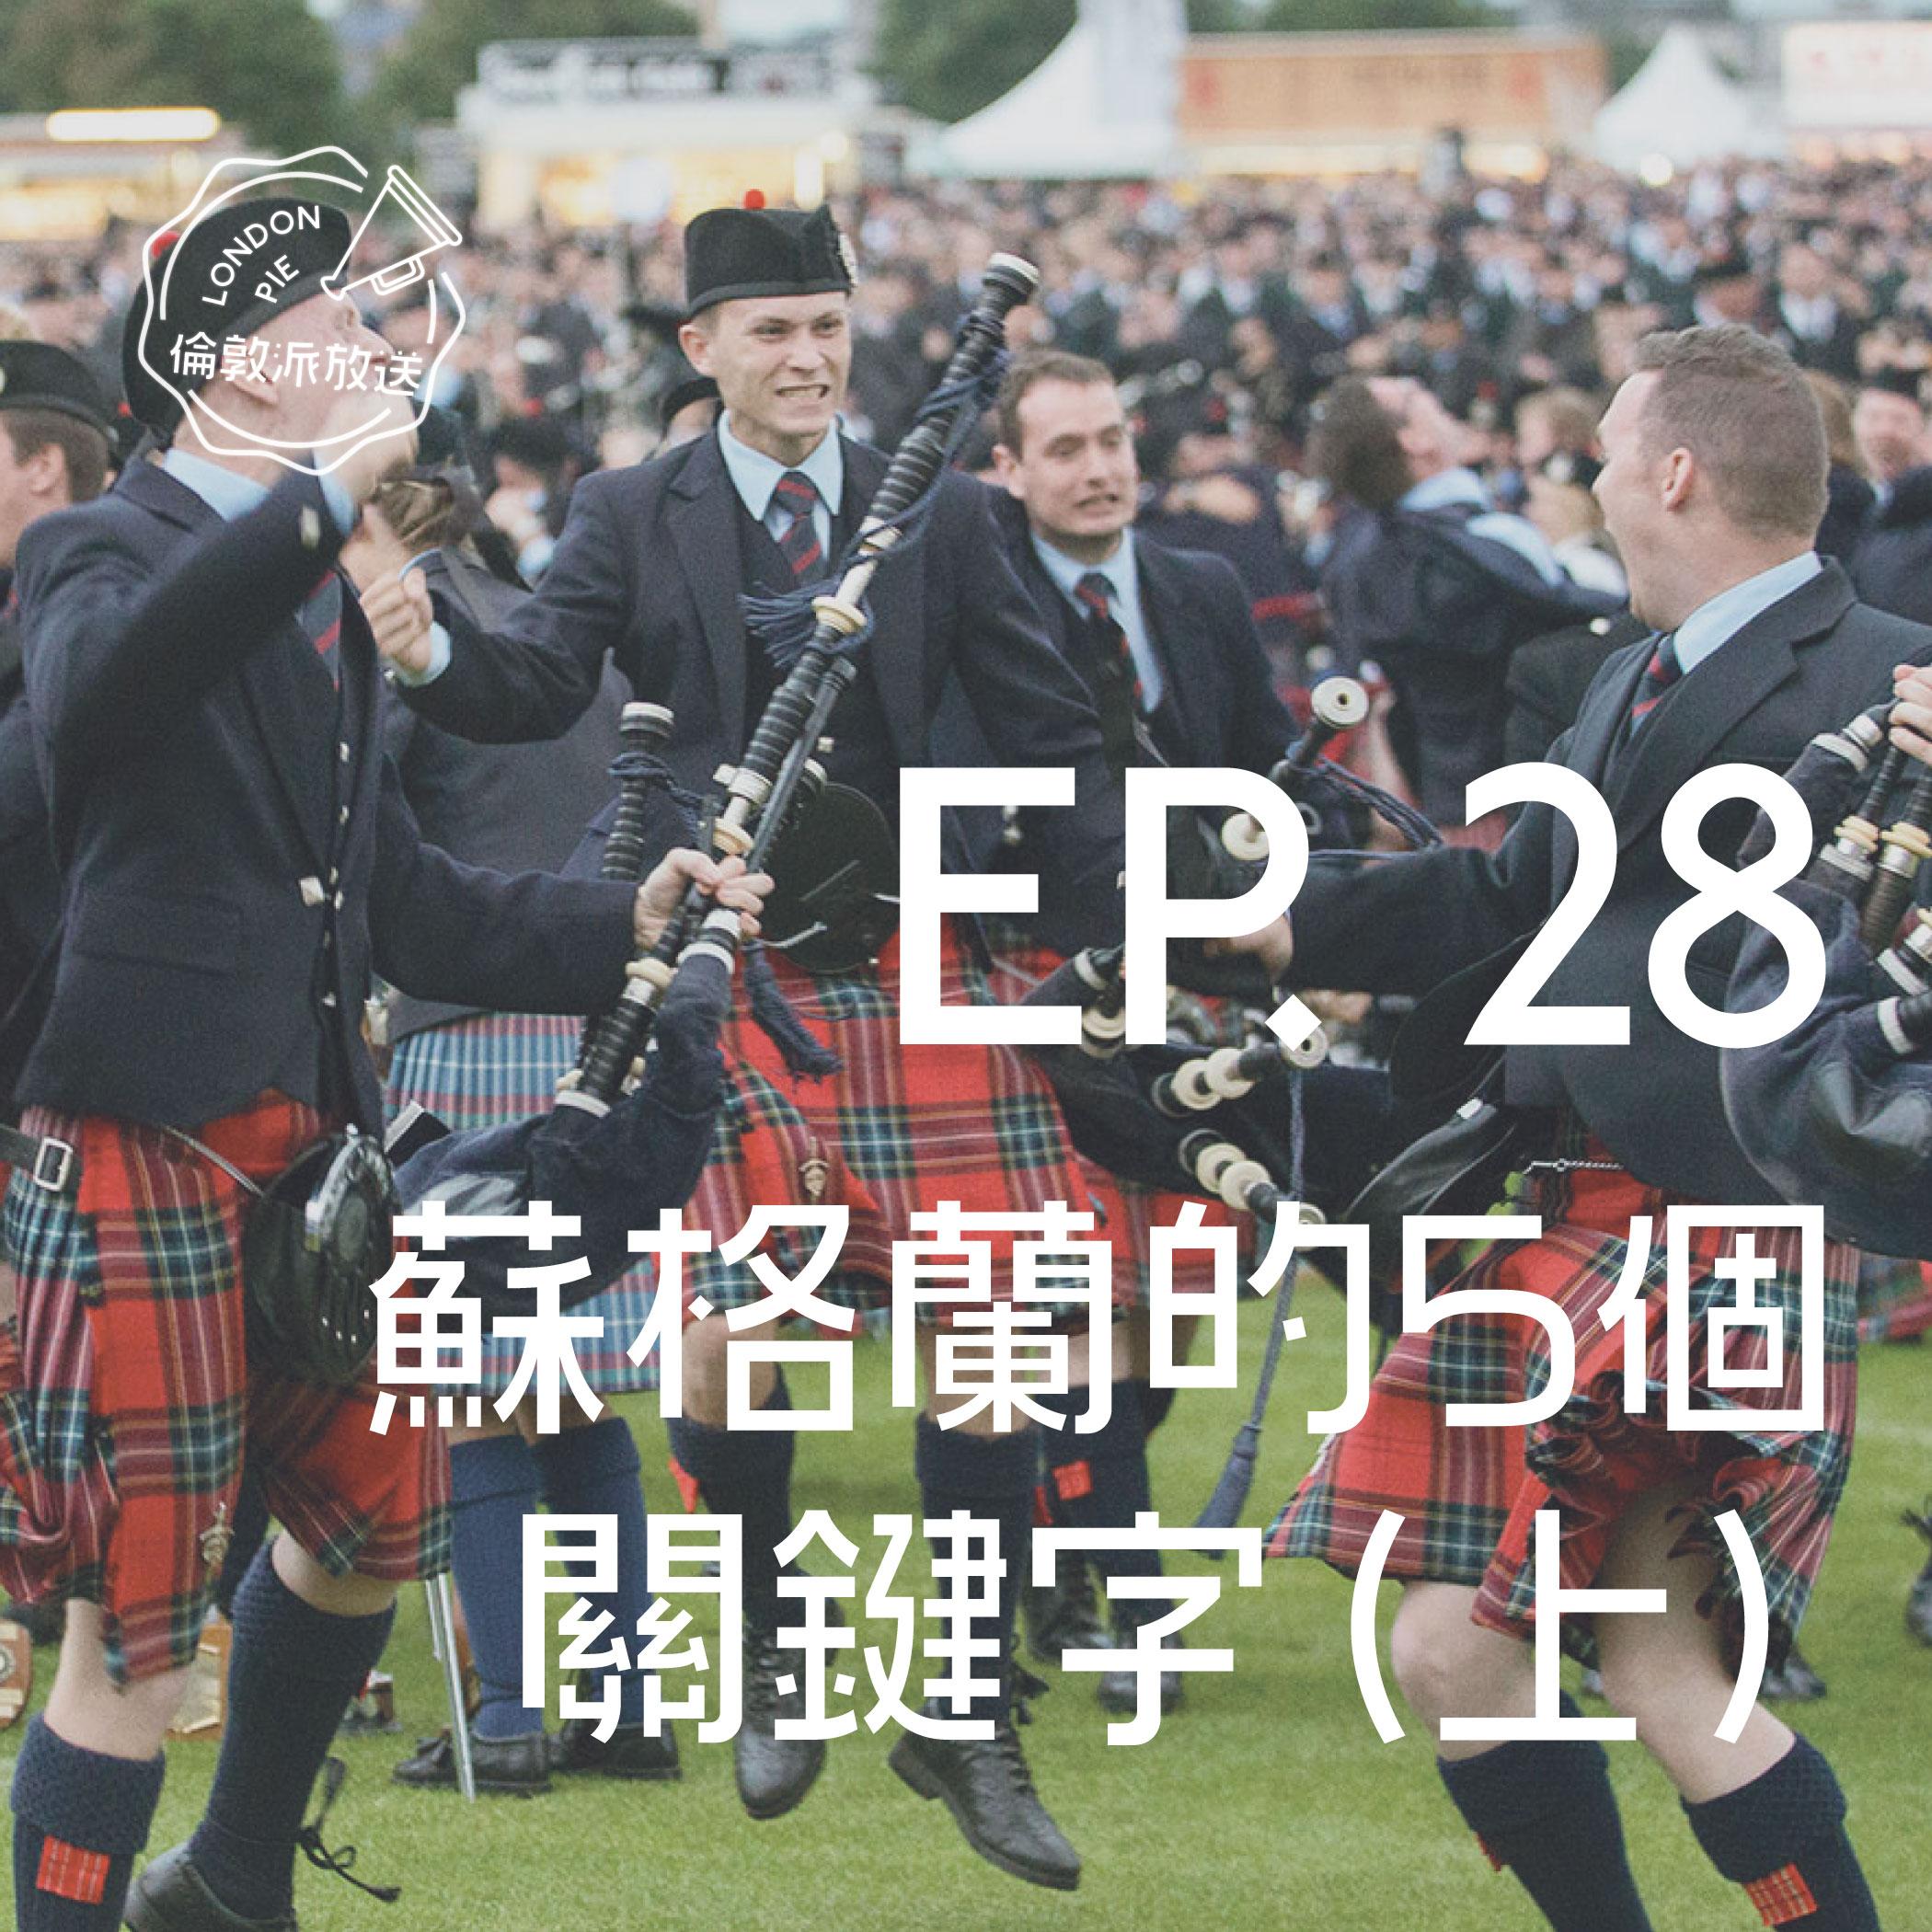 EP.28|文化慢遊:蘇格蘭的五個關鍵字(上)風笛與蘇格蘭裙